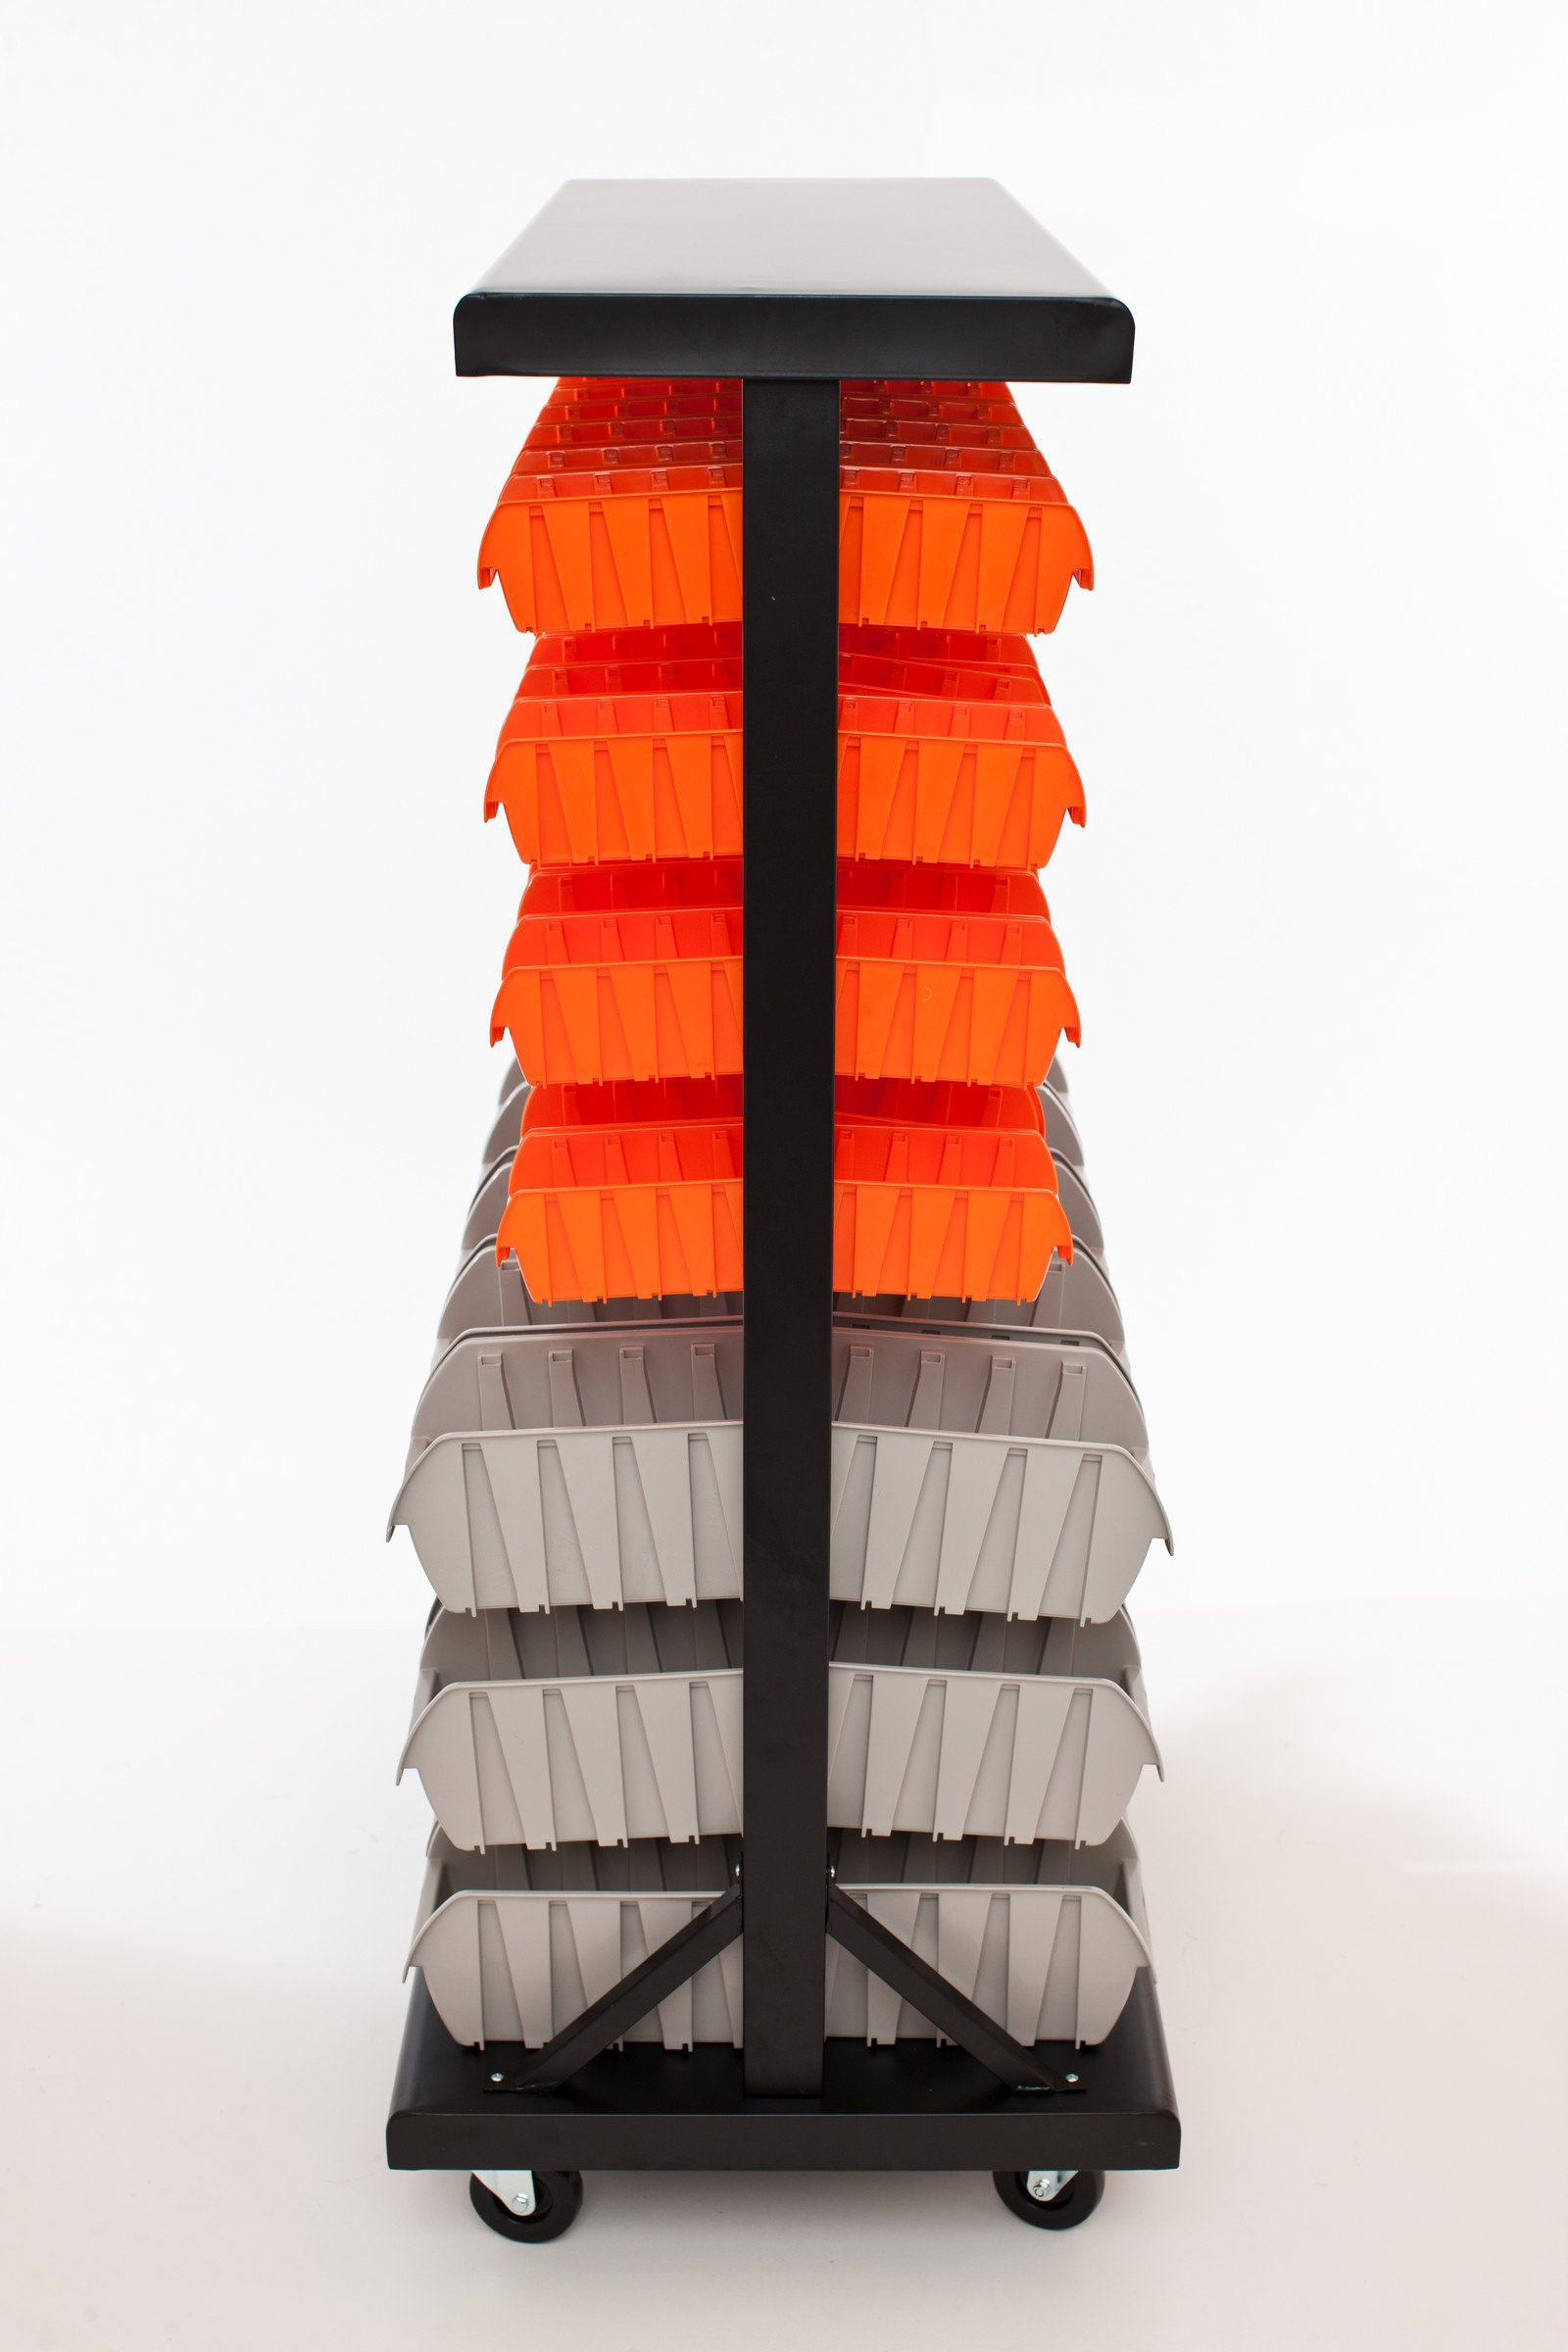 TRINITY Dual-Sided Mobile Bin Rack by Trinity (Image #3)